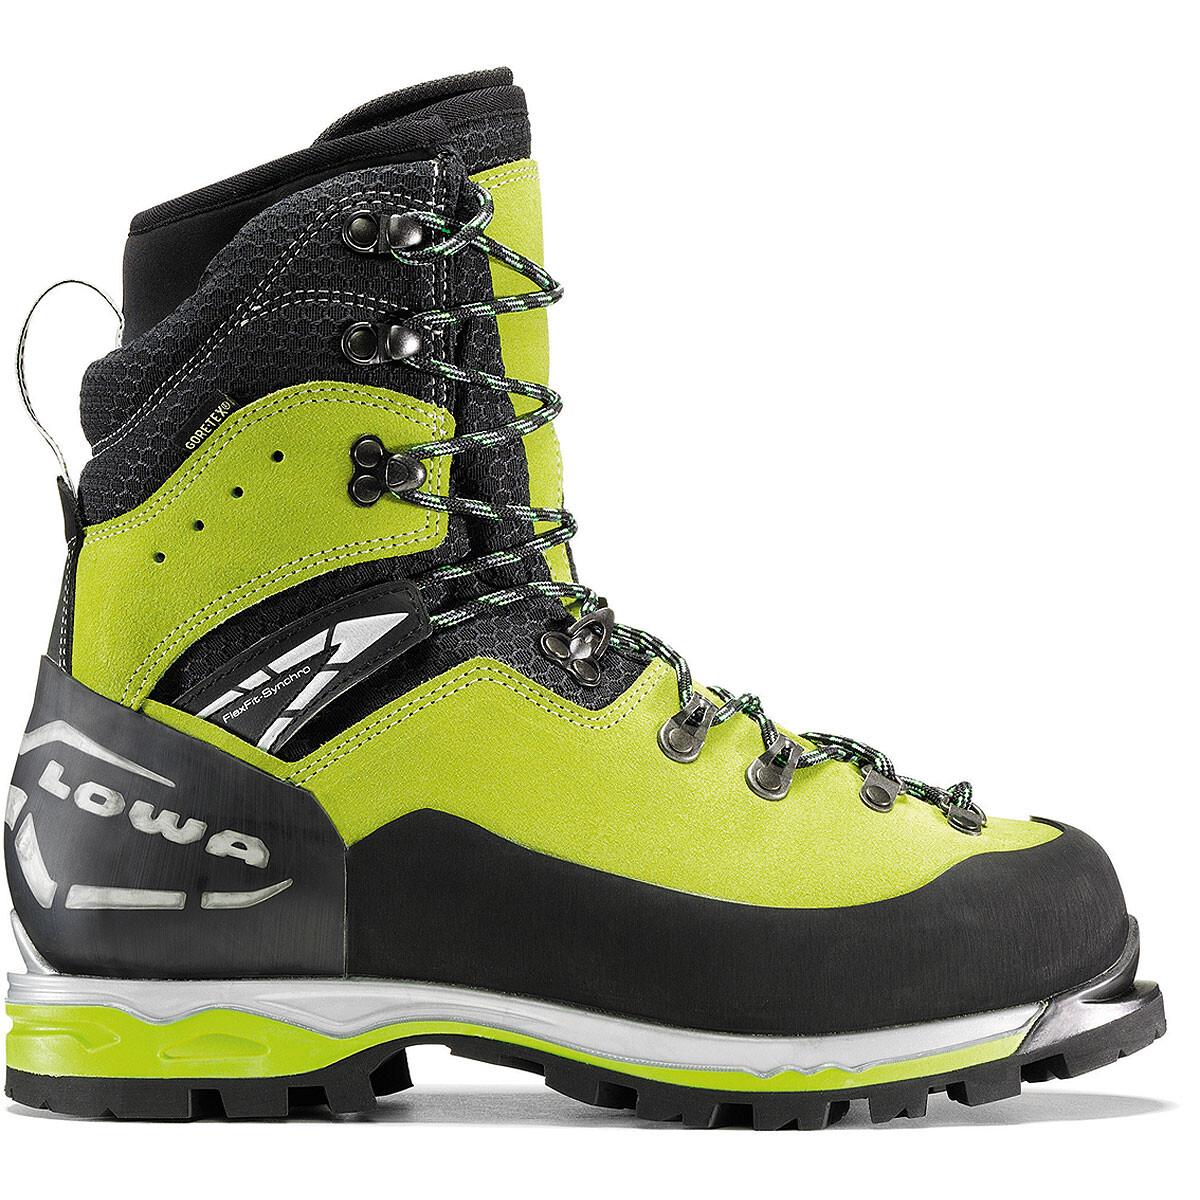 Lowa Weisshorn GTX Men limone/schwarz 44,5 winterstiefel~bergschuhe~Wanderschuhe~Stiefel~Bekleidung~Outdoor~outdoorbekleidung~outdoorstiefel